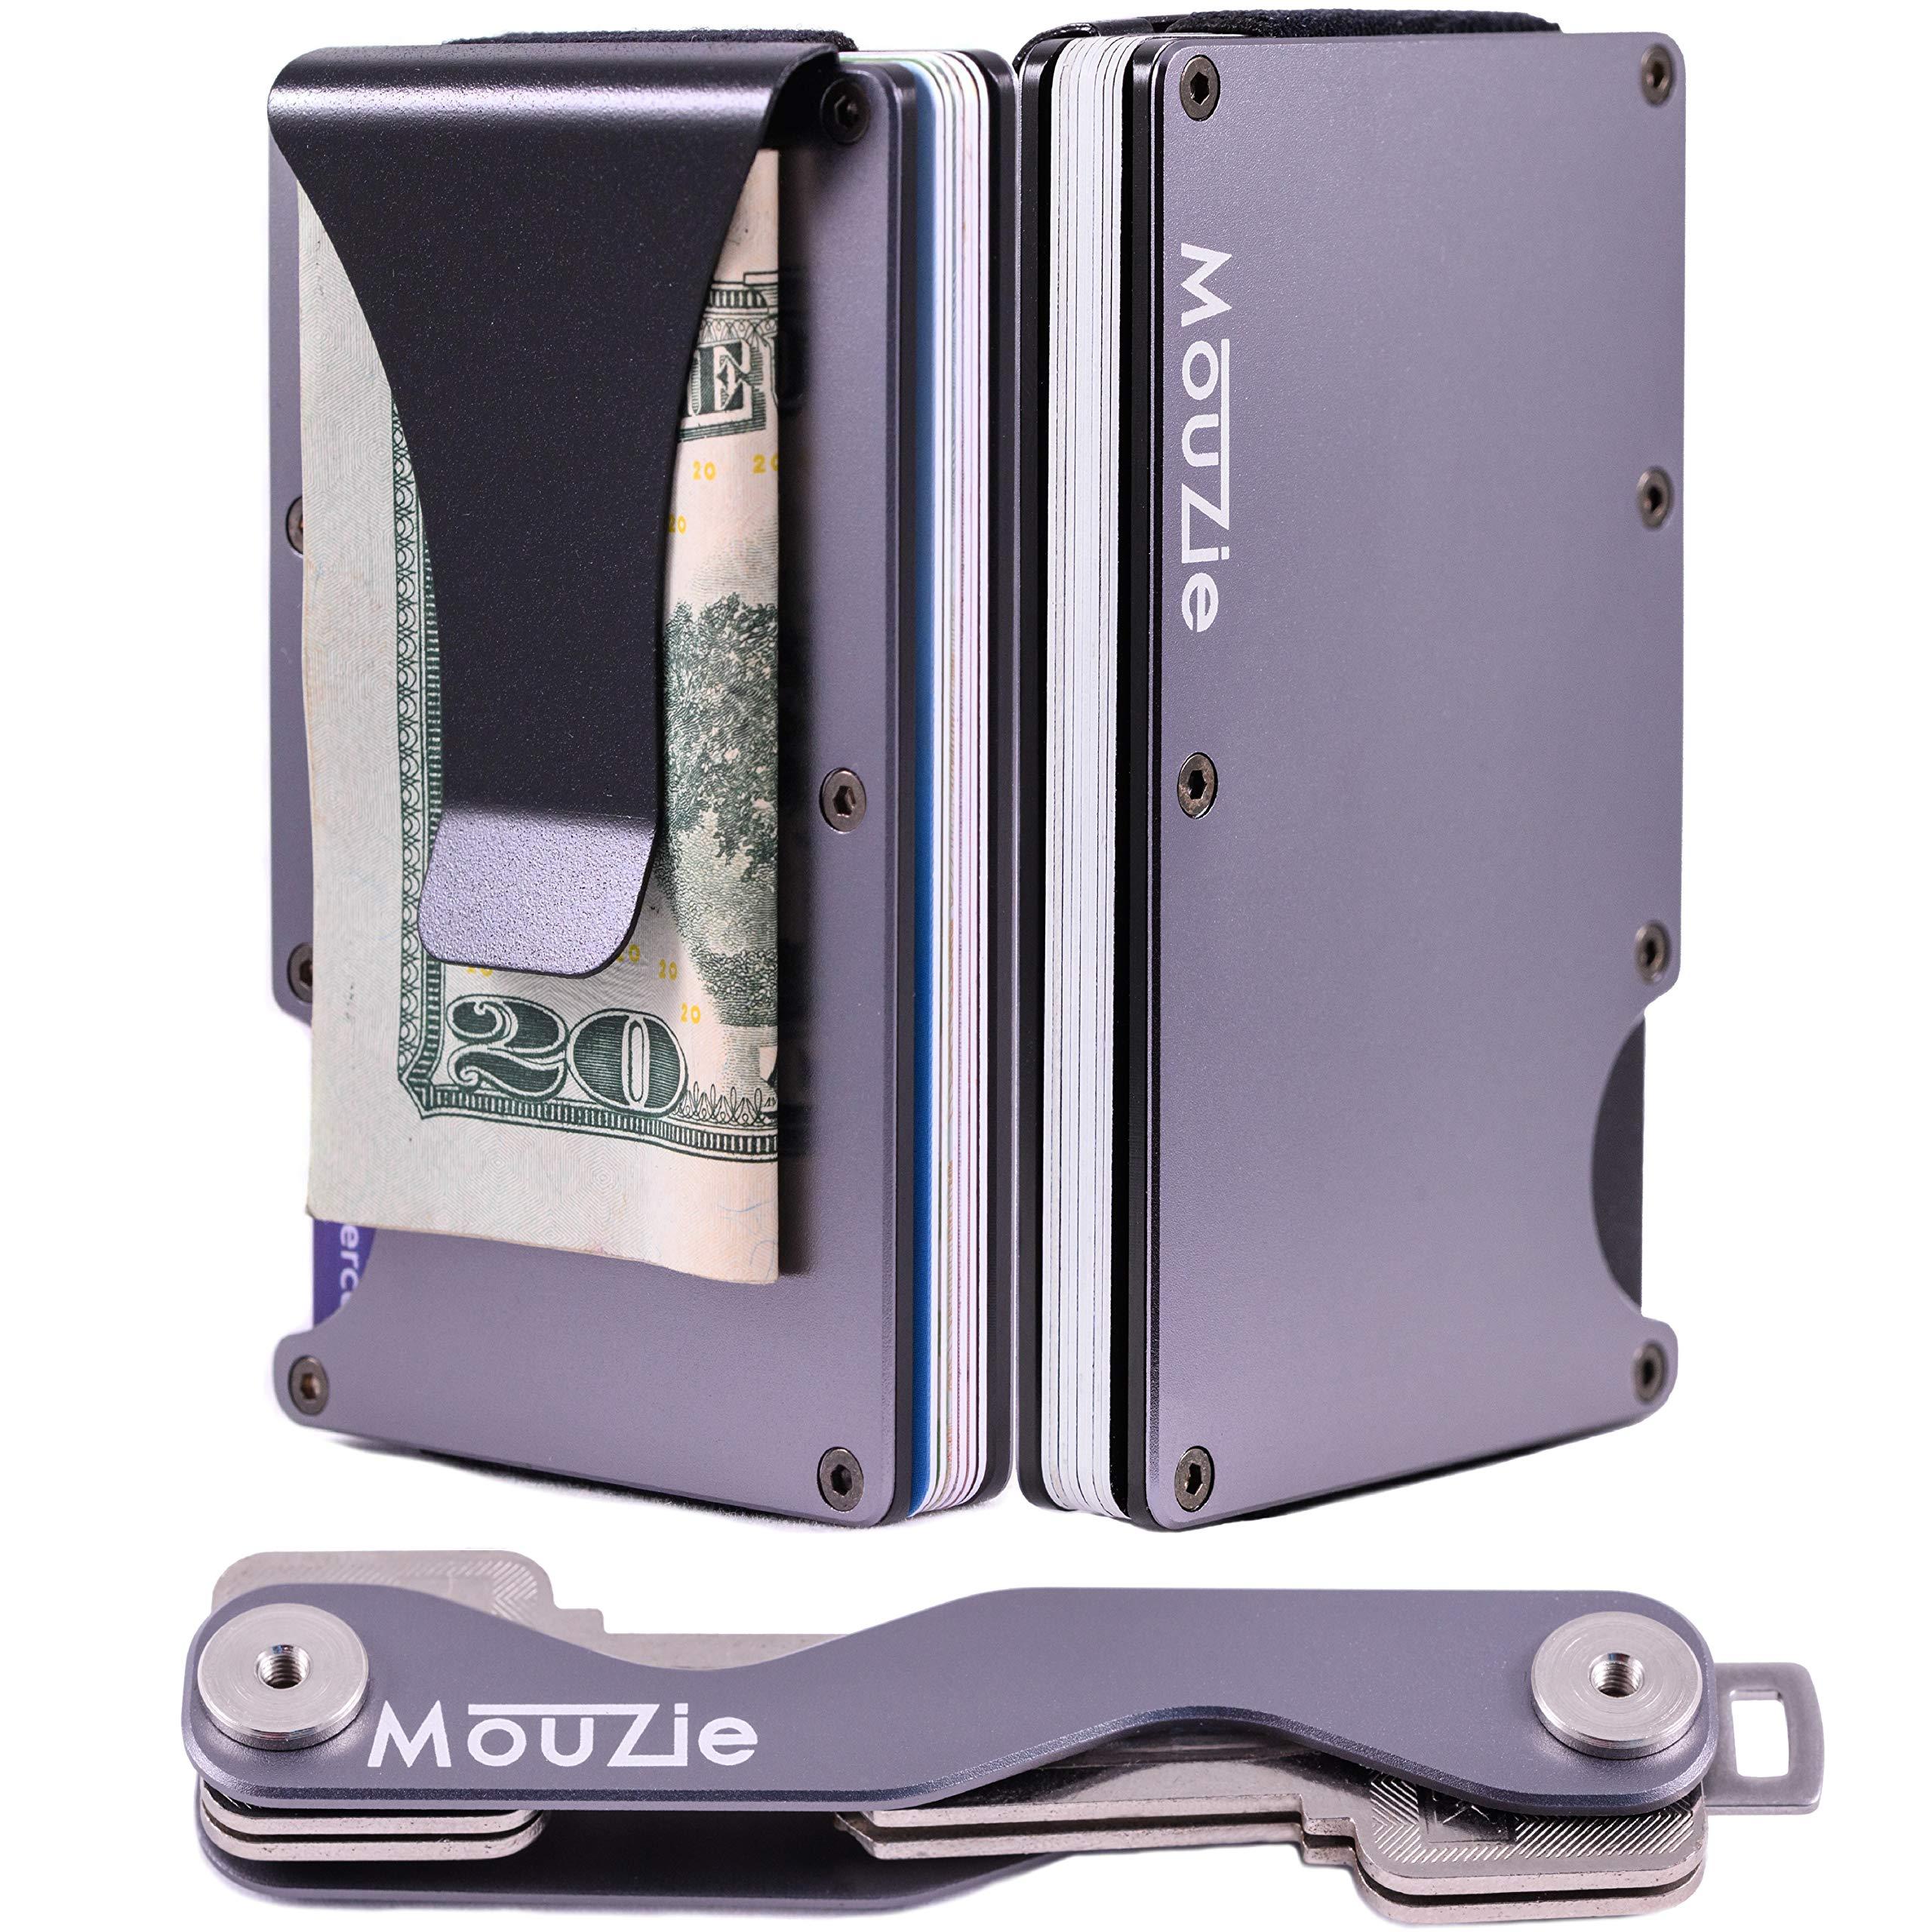 MouZie Gunmetal Money Clip + Cash Strap Band Slim Aluminum RFID Blocking Minimalist Premium Front Pocket Credit Card Holder Wallet + Compact Key Organizer Keychain Set Gift For Men Women